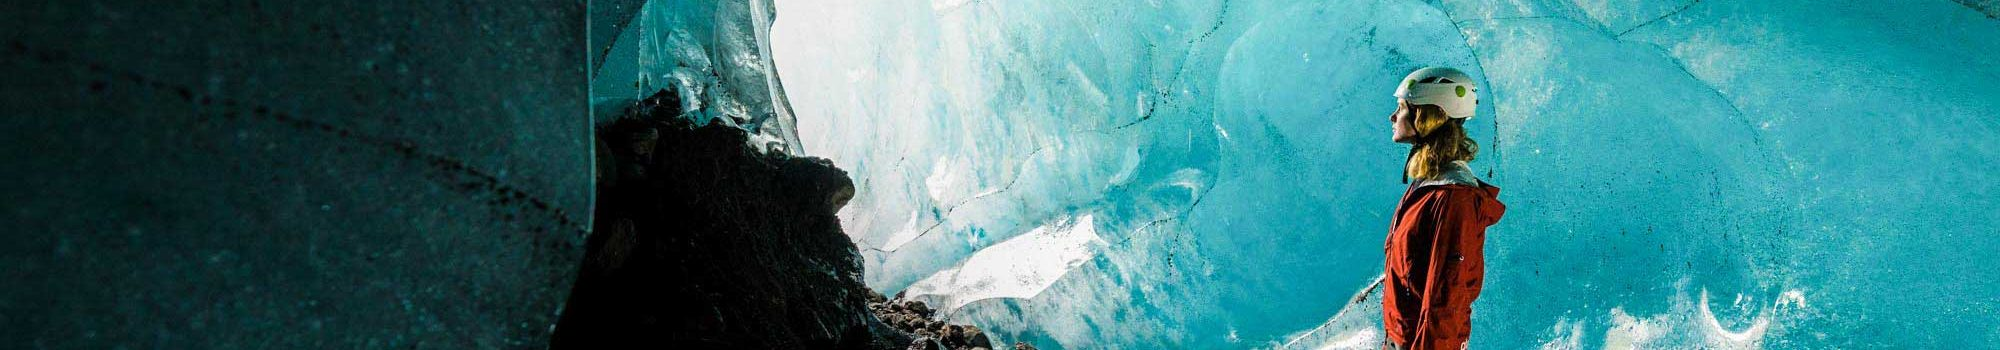 Into the Glacier tour Iceland